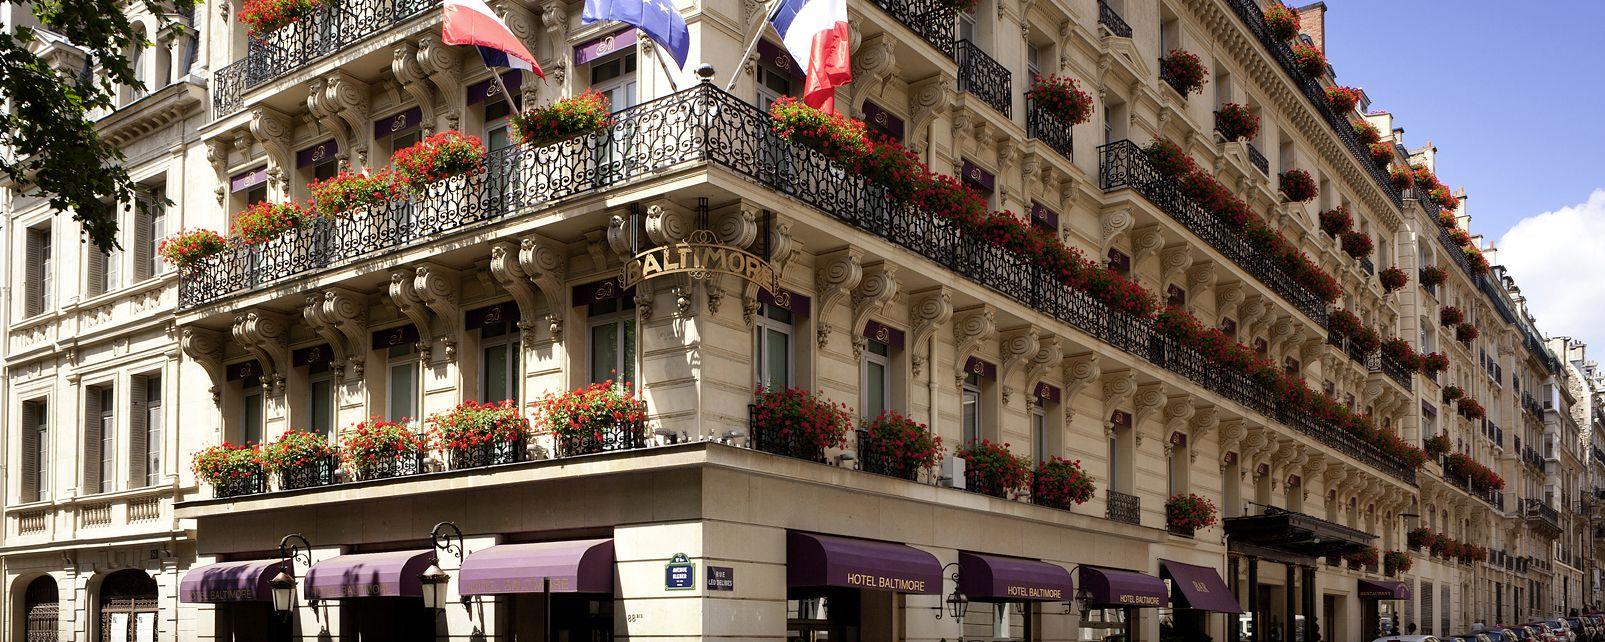 Hotel sofitel paris baltimore tour eiffel parigi francia - Restaurant dernier etage tour eiffel ...